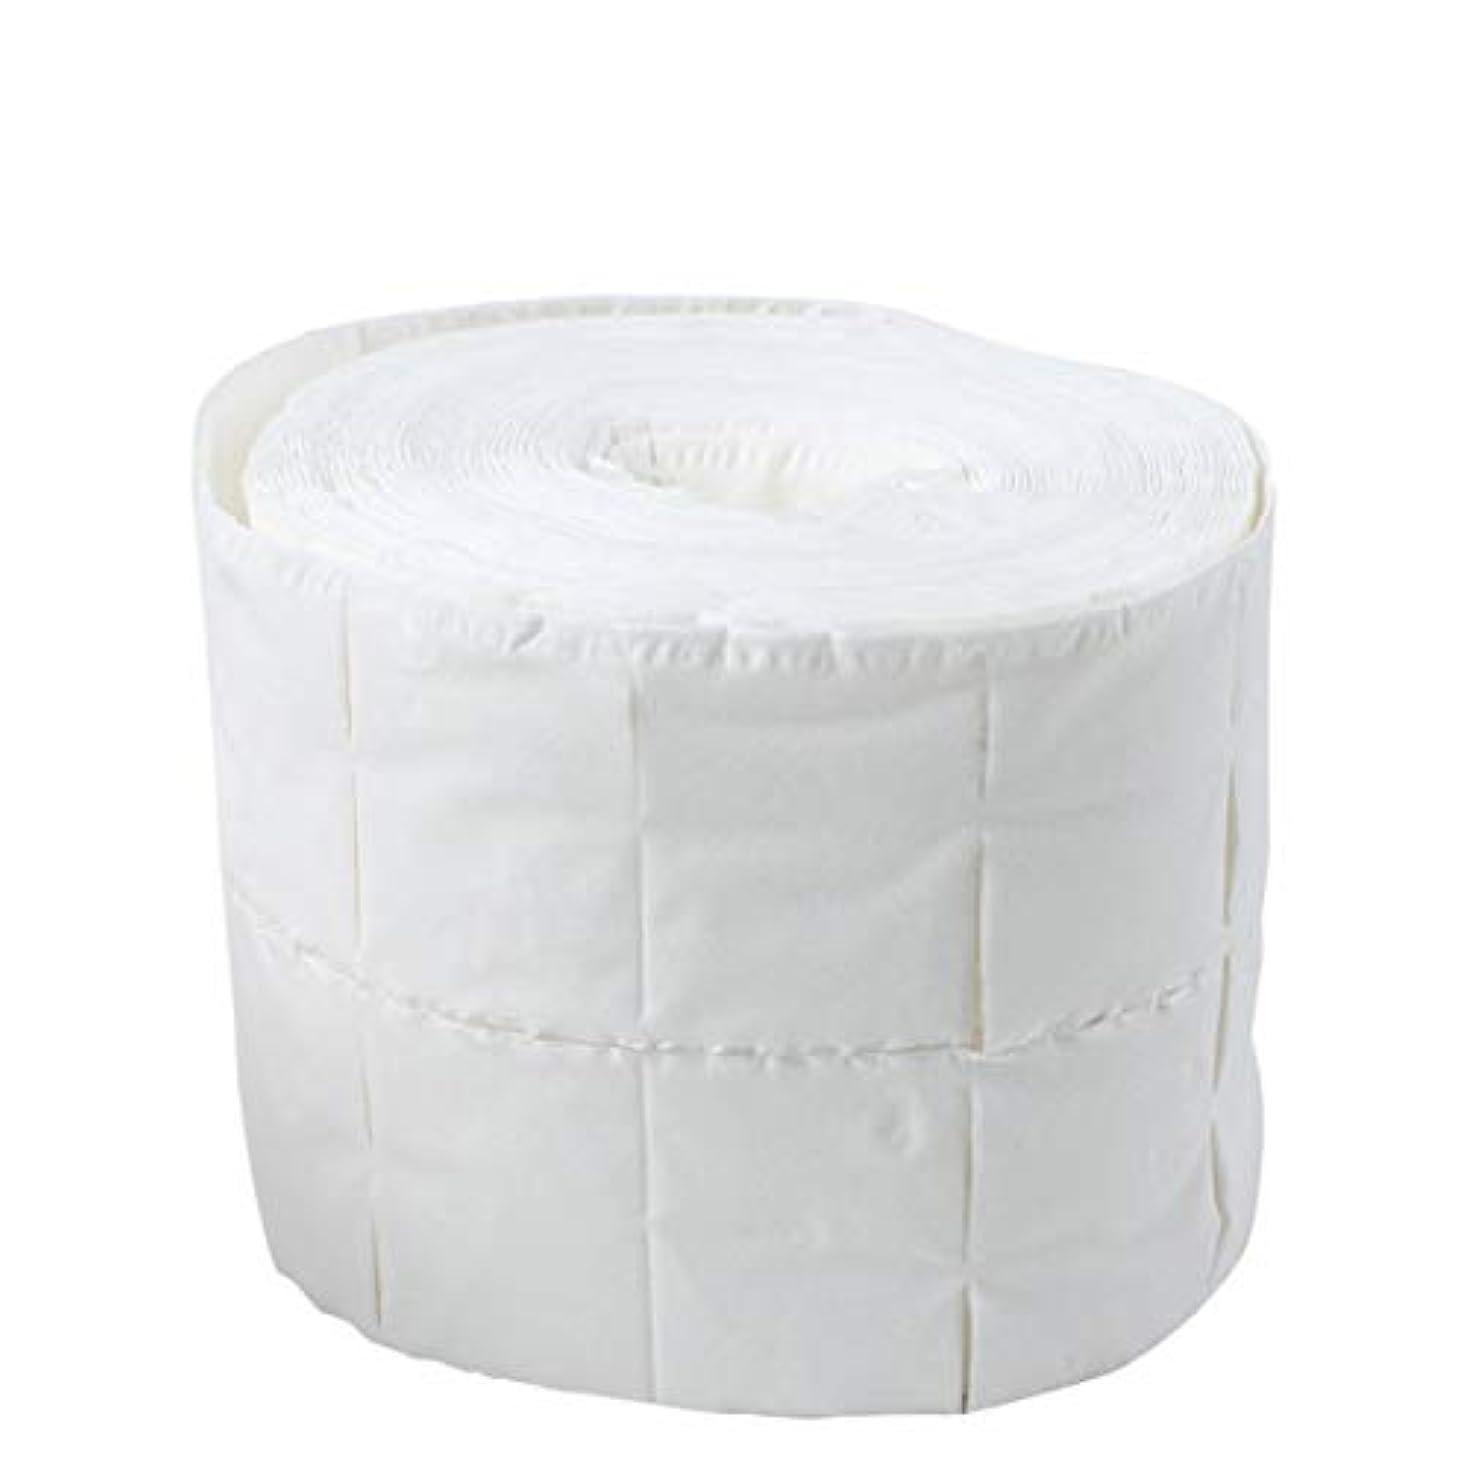 Intercoreyポータブルトラベルブランドマニキュアリムーバークリアナーネイルジェル軽量耐久性のある使用ネイルラップ洗濯タオルウォッシュ